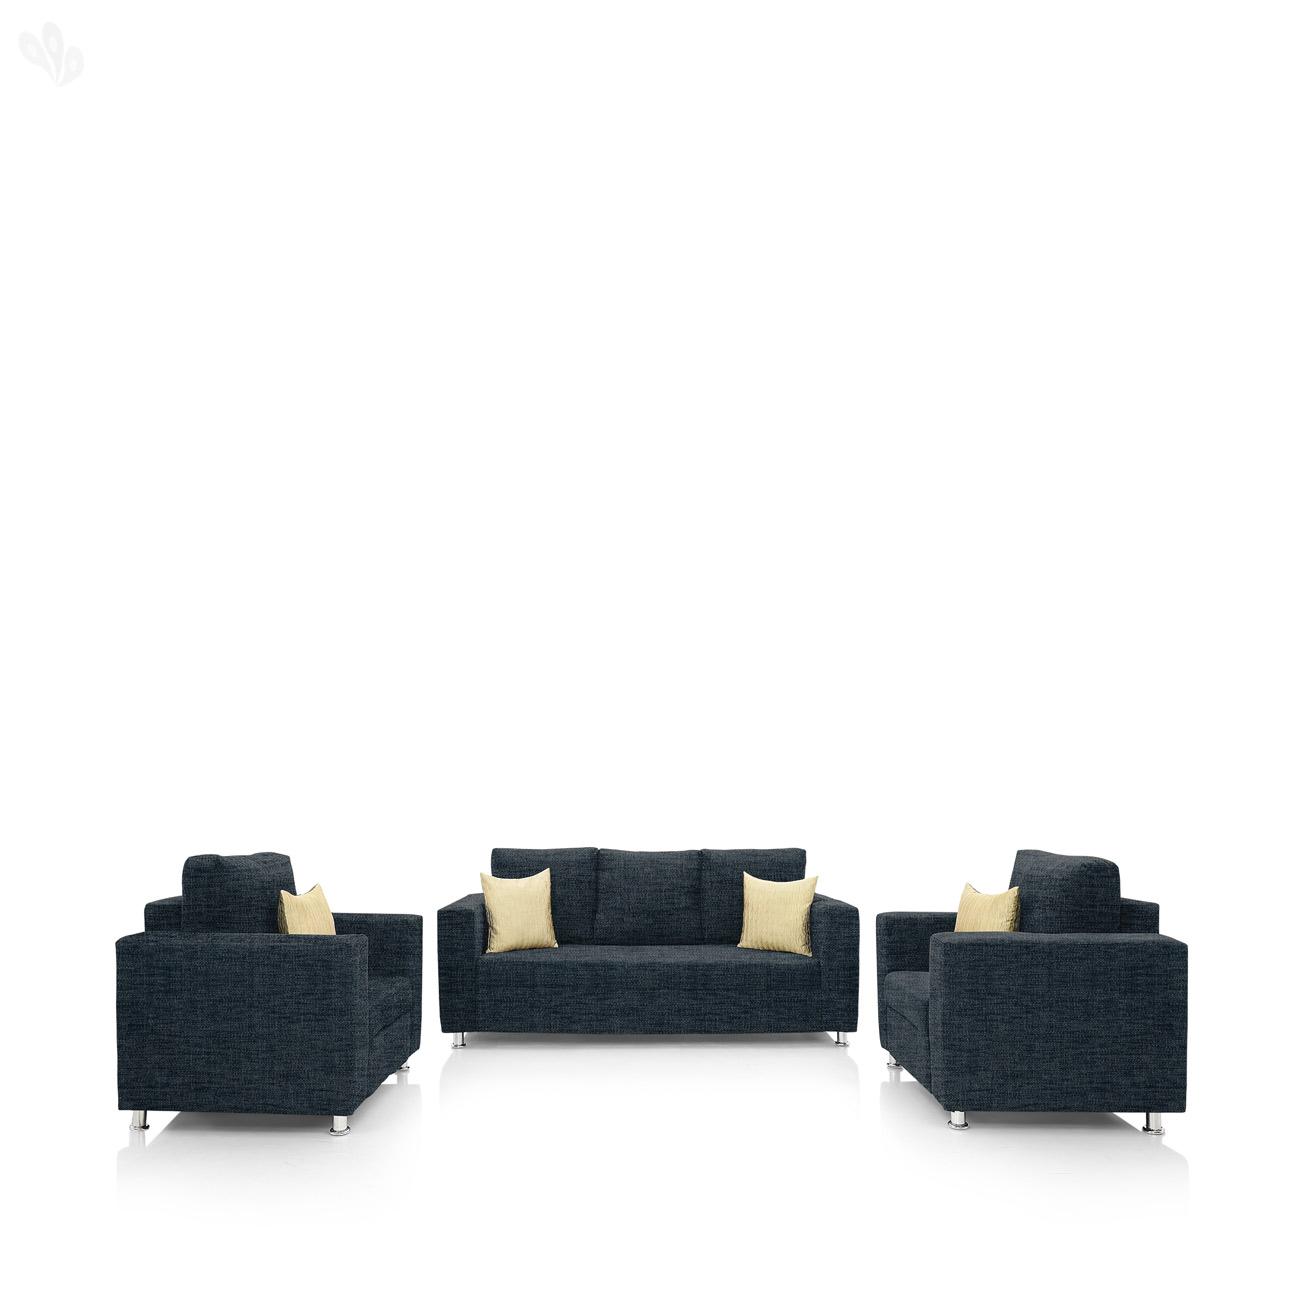 Earthwood   Fully Fabric Upholstered Sofa Set 3+1+1   Premium Valencia Dark Blue